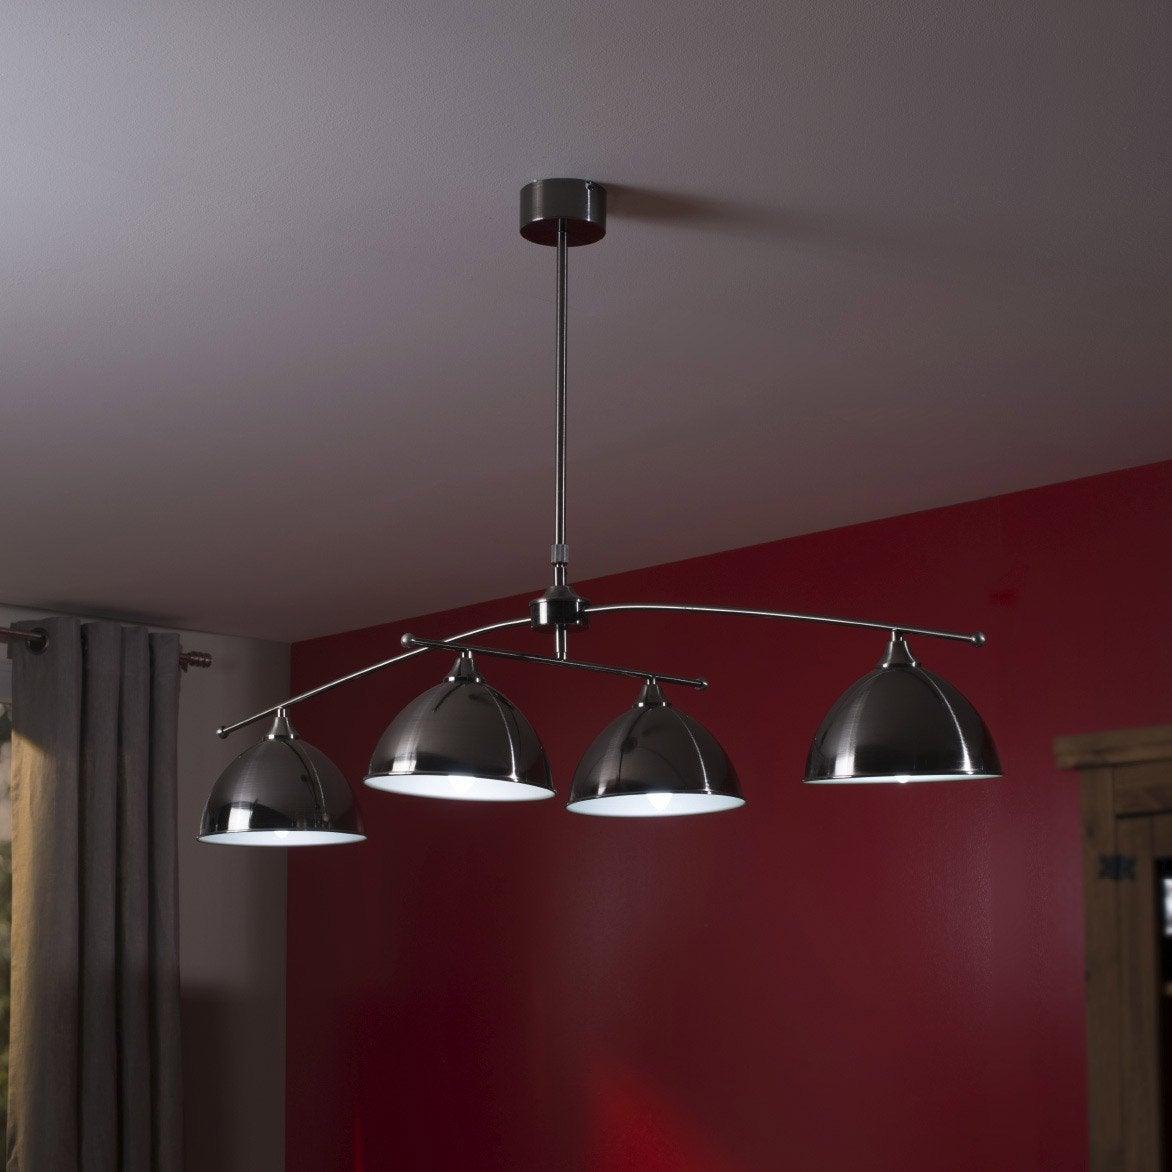 suspension luminaire brilliant style industriel enzio. Black Bedroom Furniture Sets. Home Design Ideas